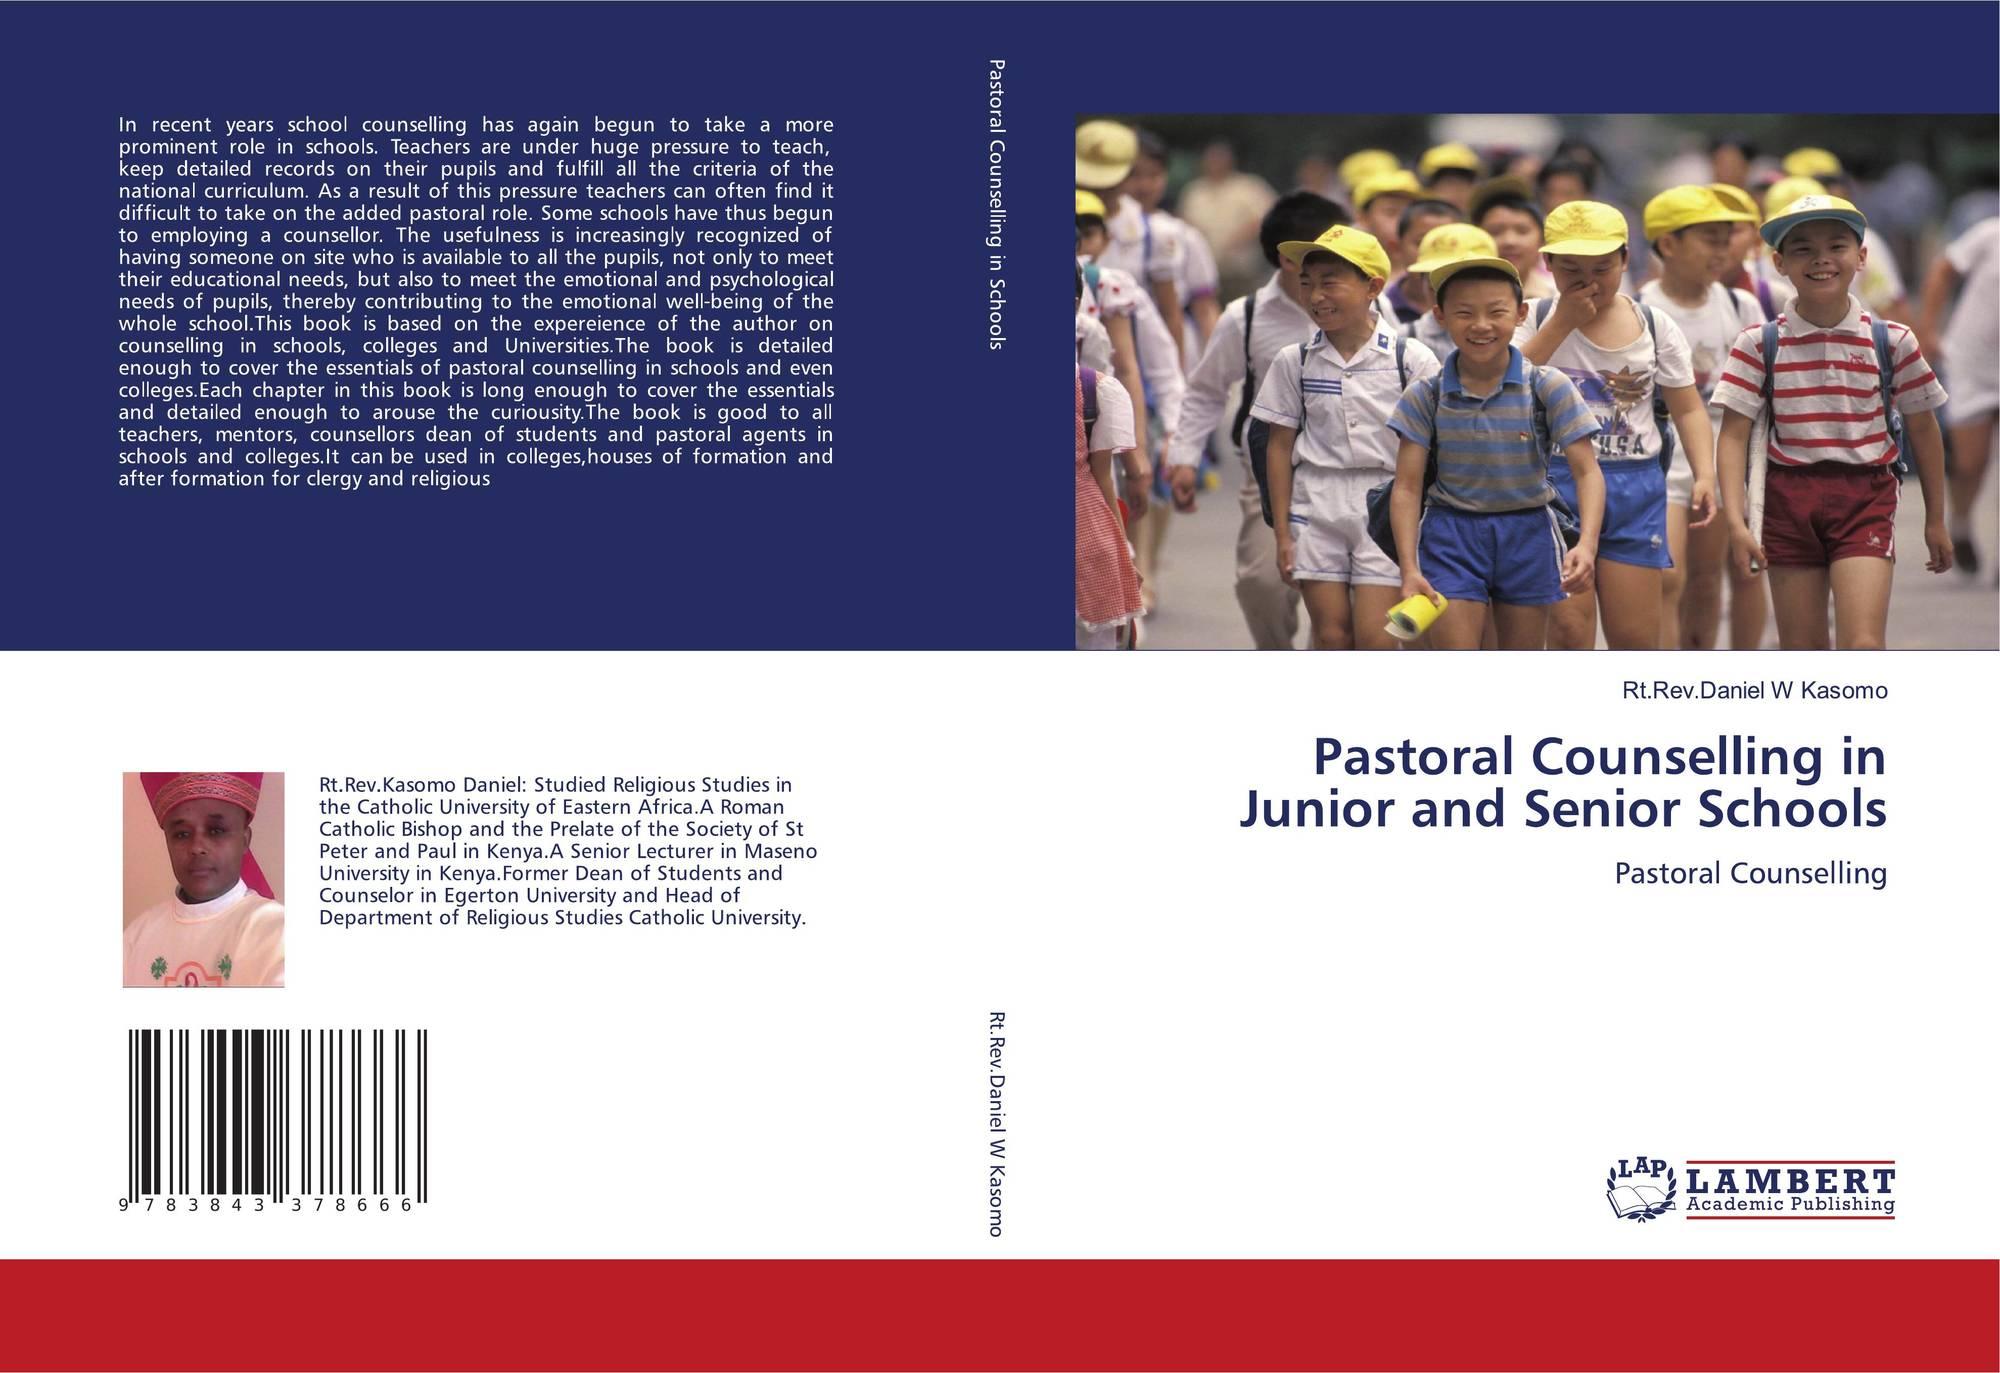 an analysis of pastoralism